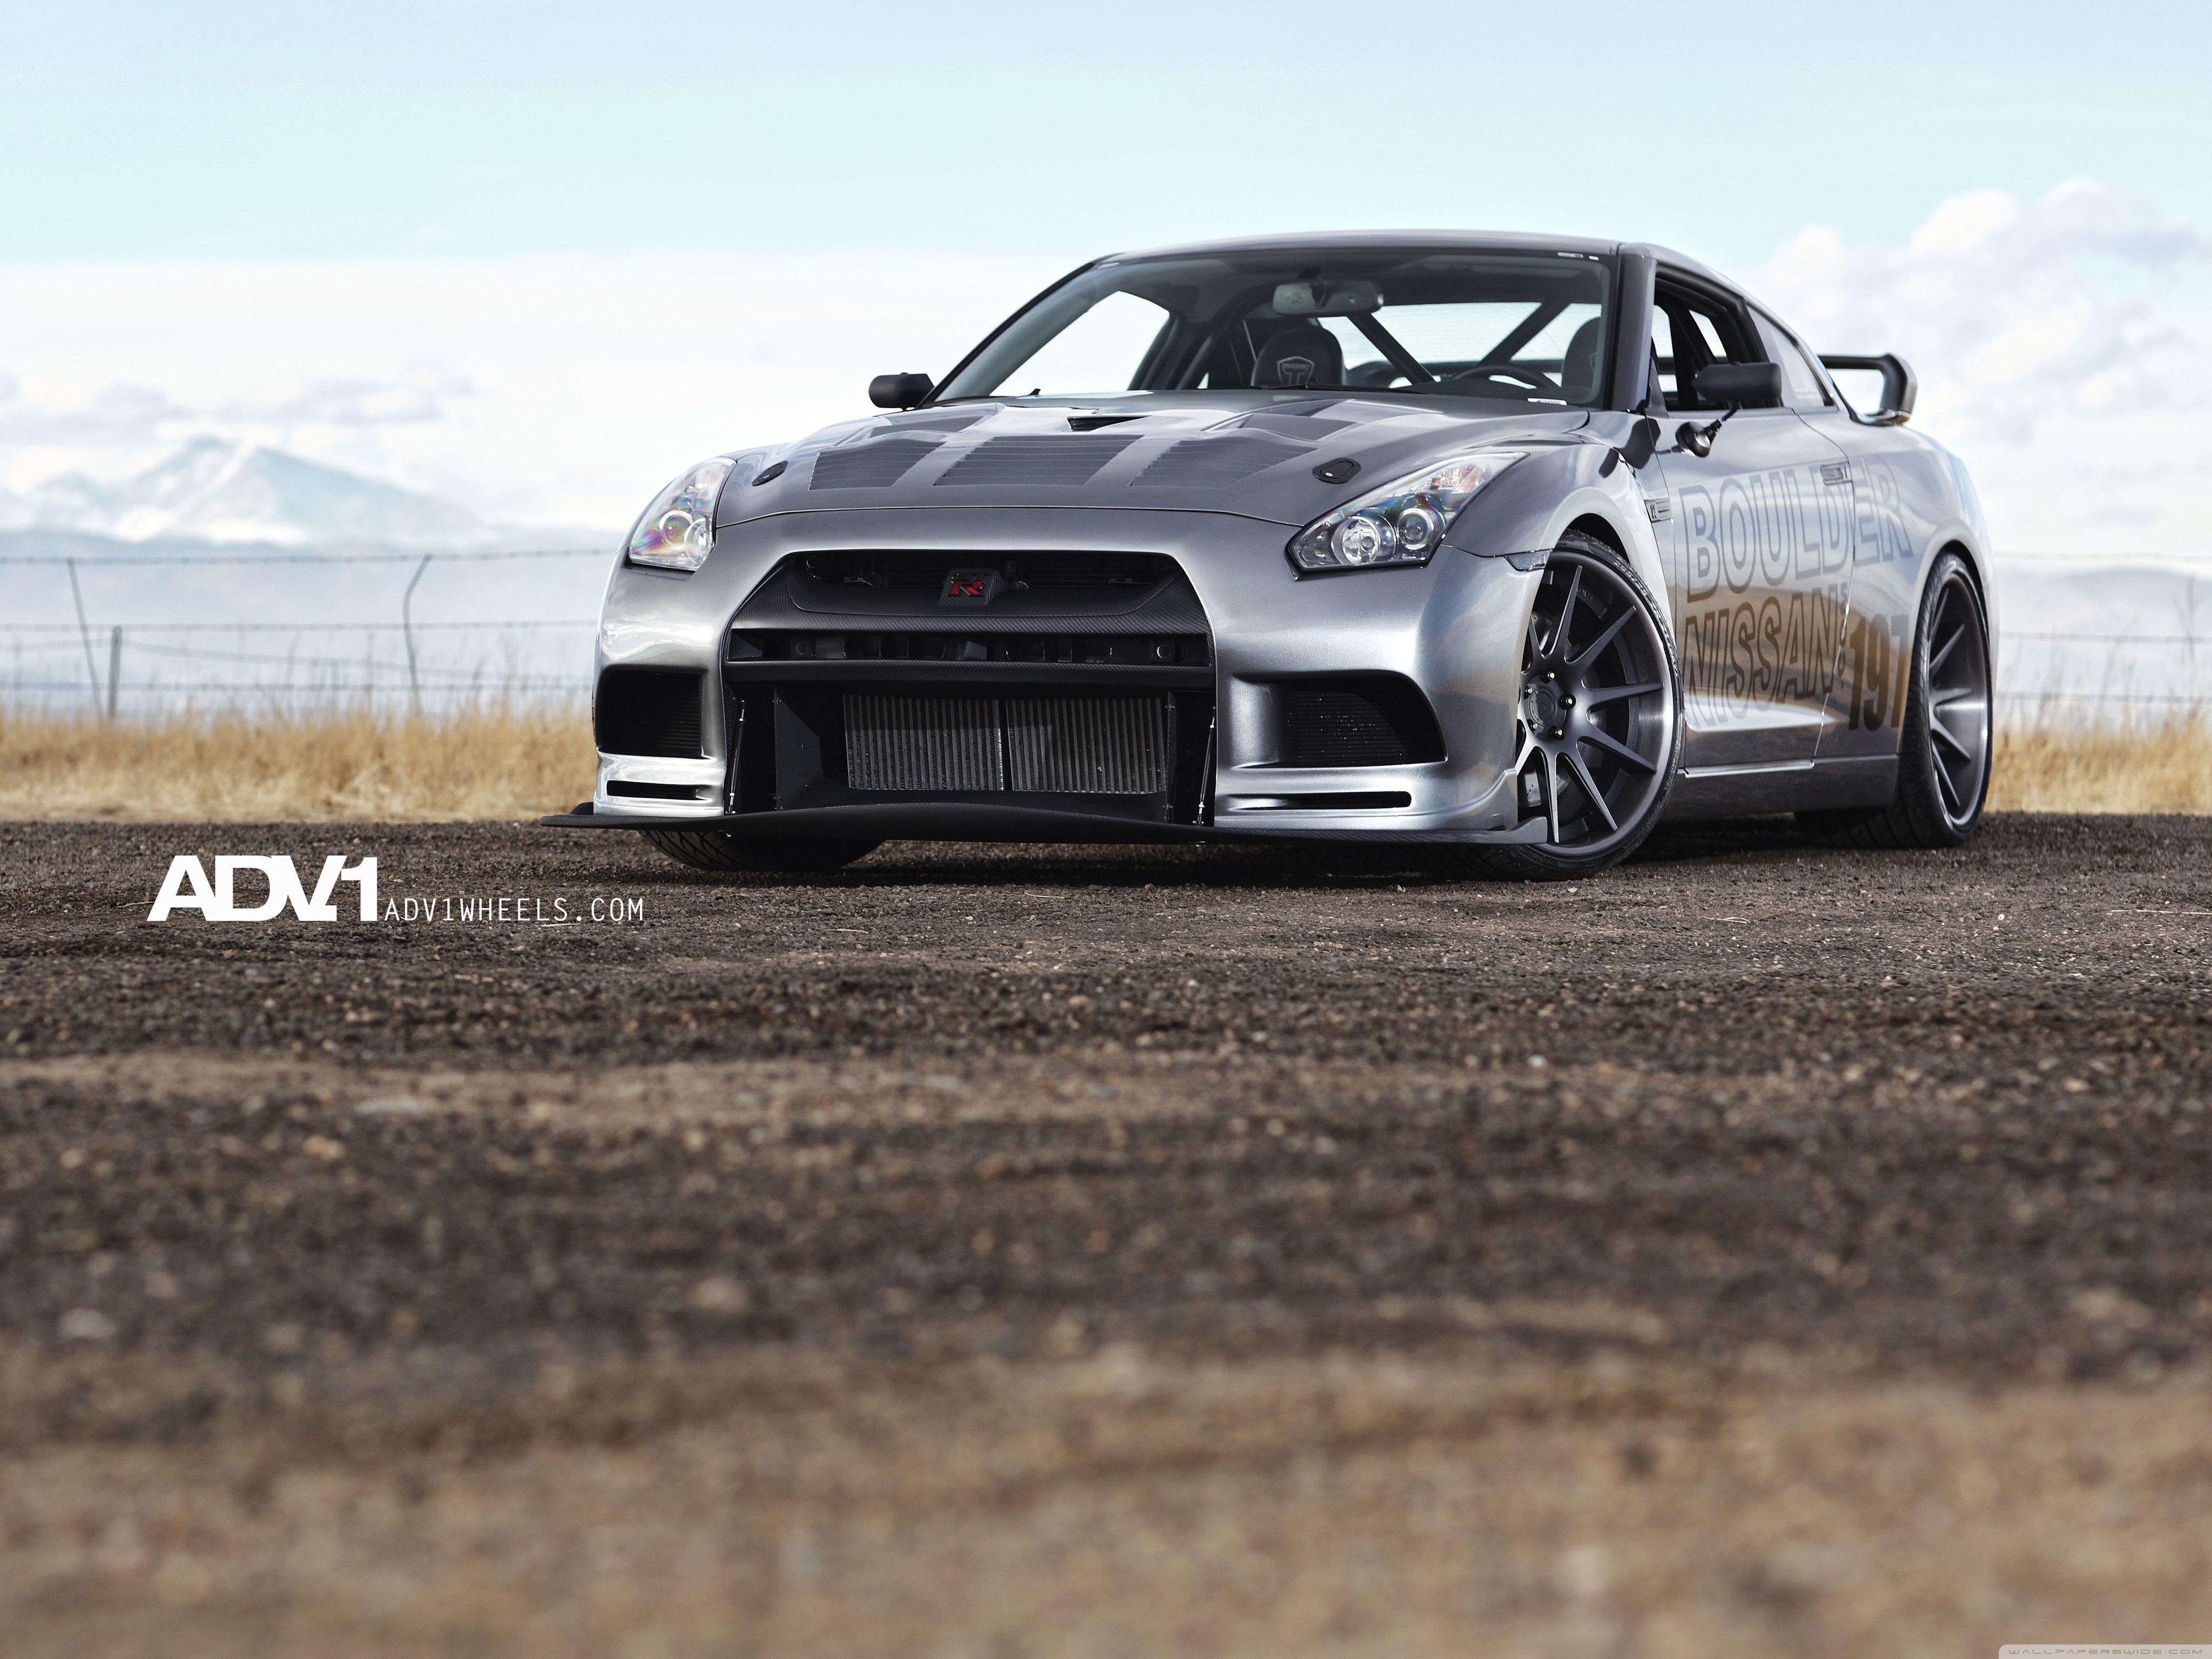 Charmant For Your Desktop RollsRoyce Phantom Wallpapers Top Quality. Nissan R, Car  ...